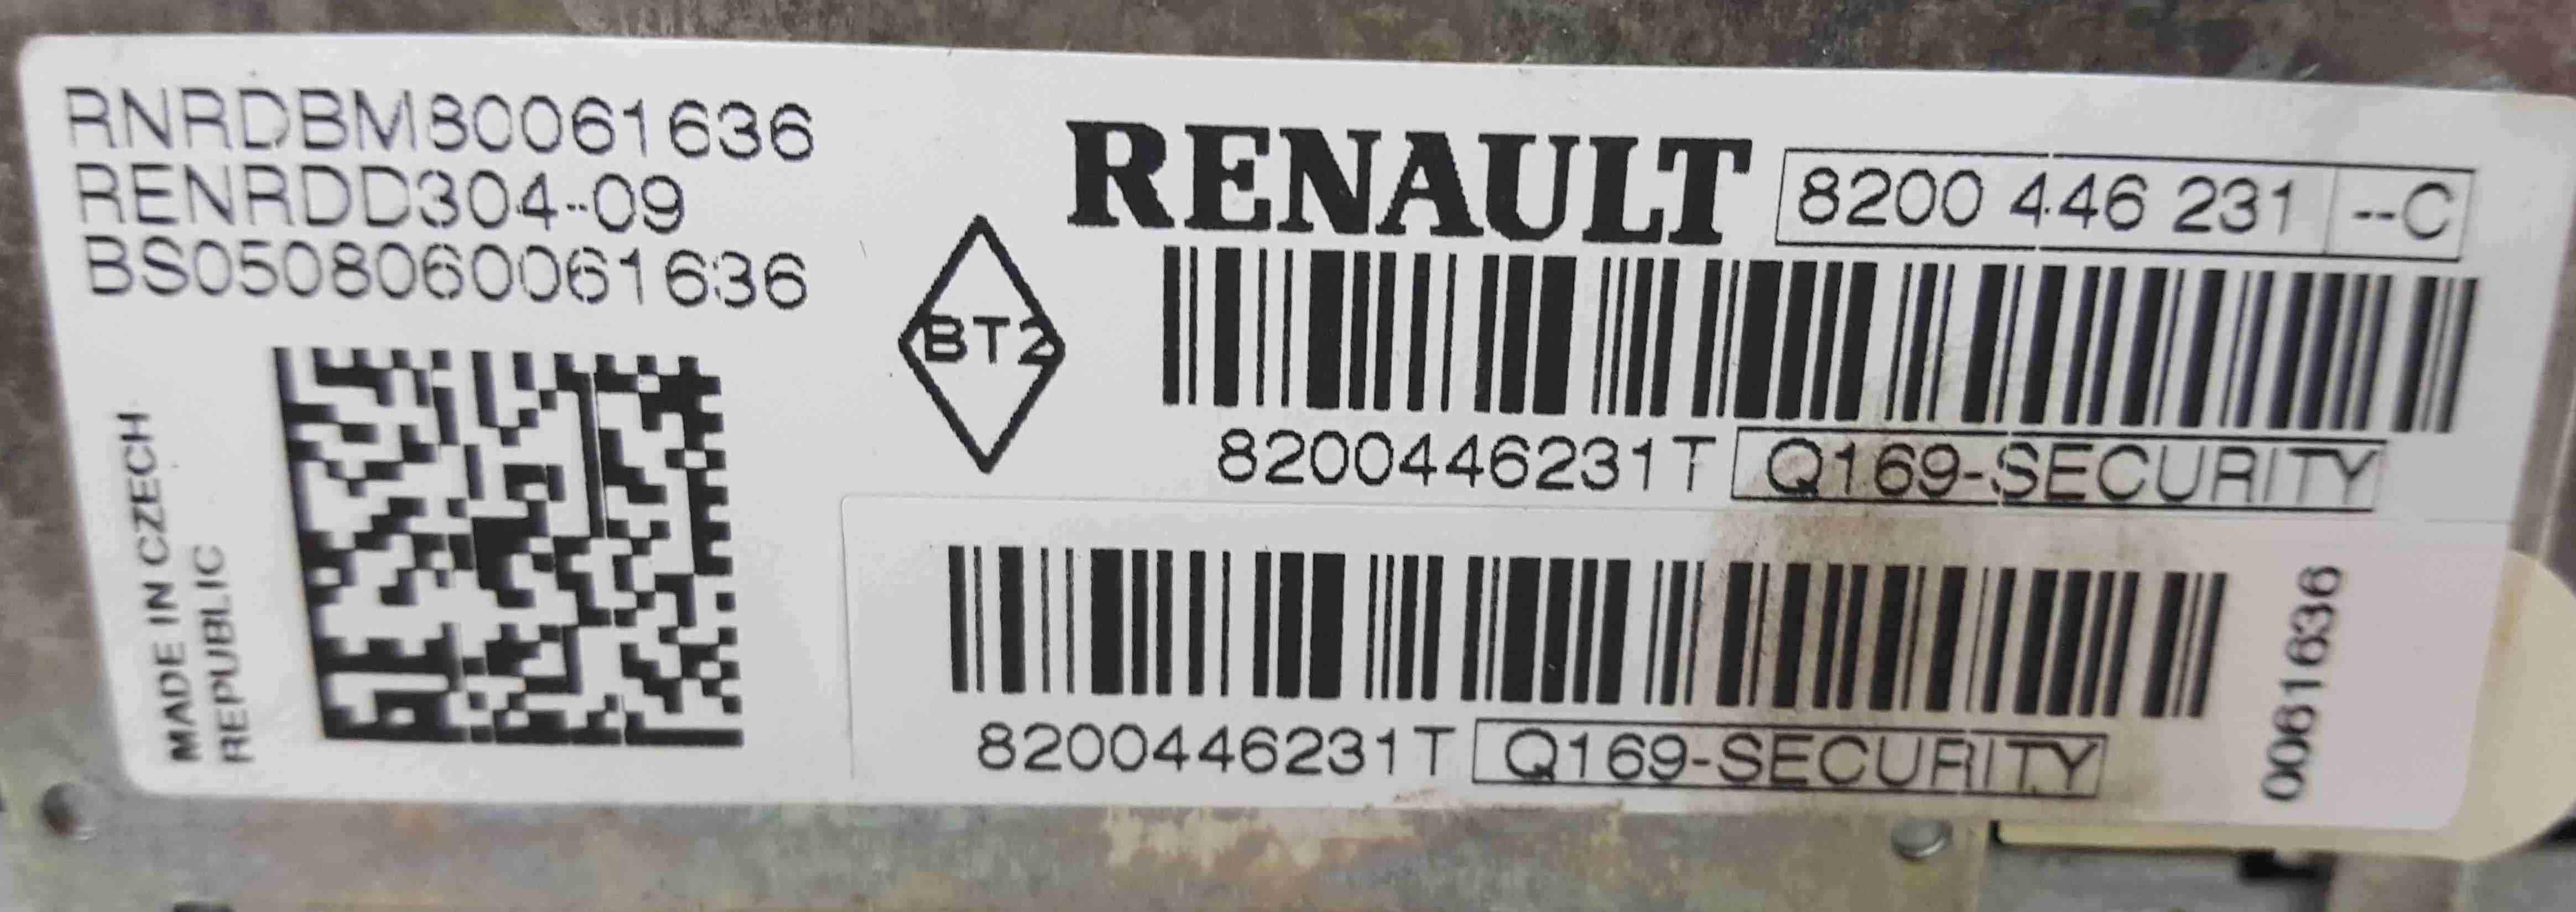 Renault Twingo 2007-2011 Radio Cd Player Update List + Code 8200446231